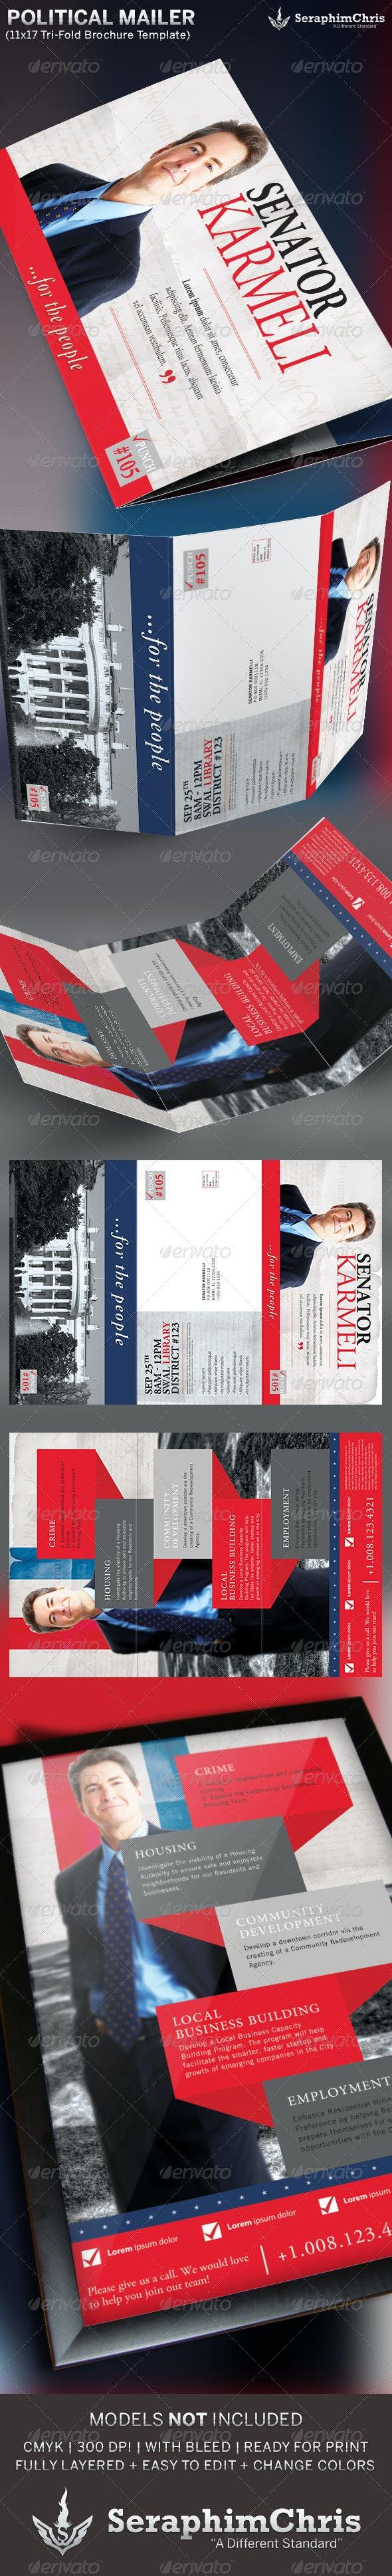 Large Political Tri-Fold Brochure Mailer Template - Corporate Brochures